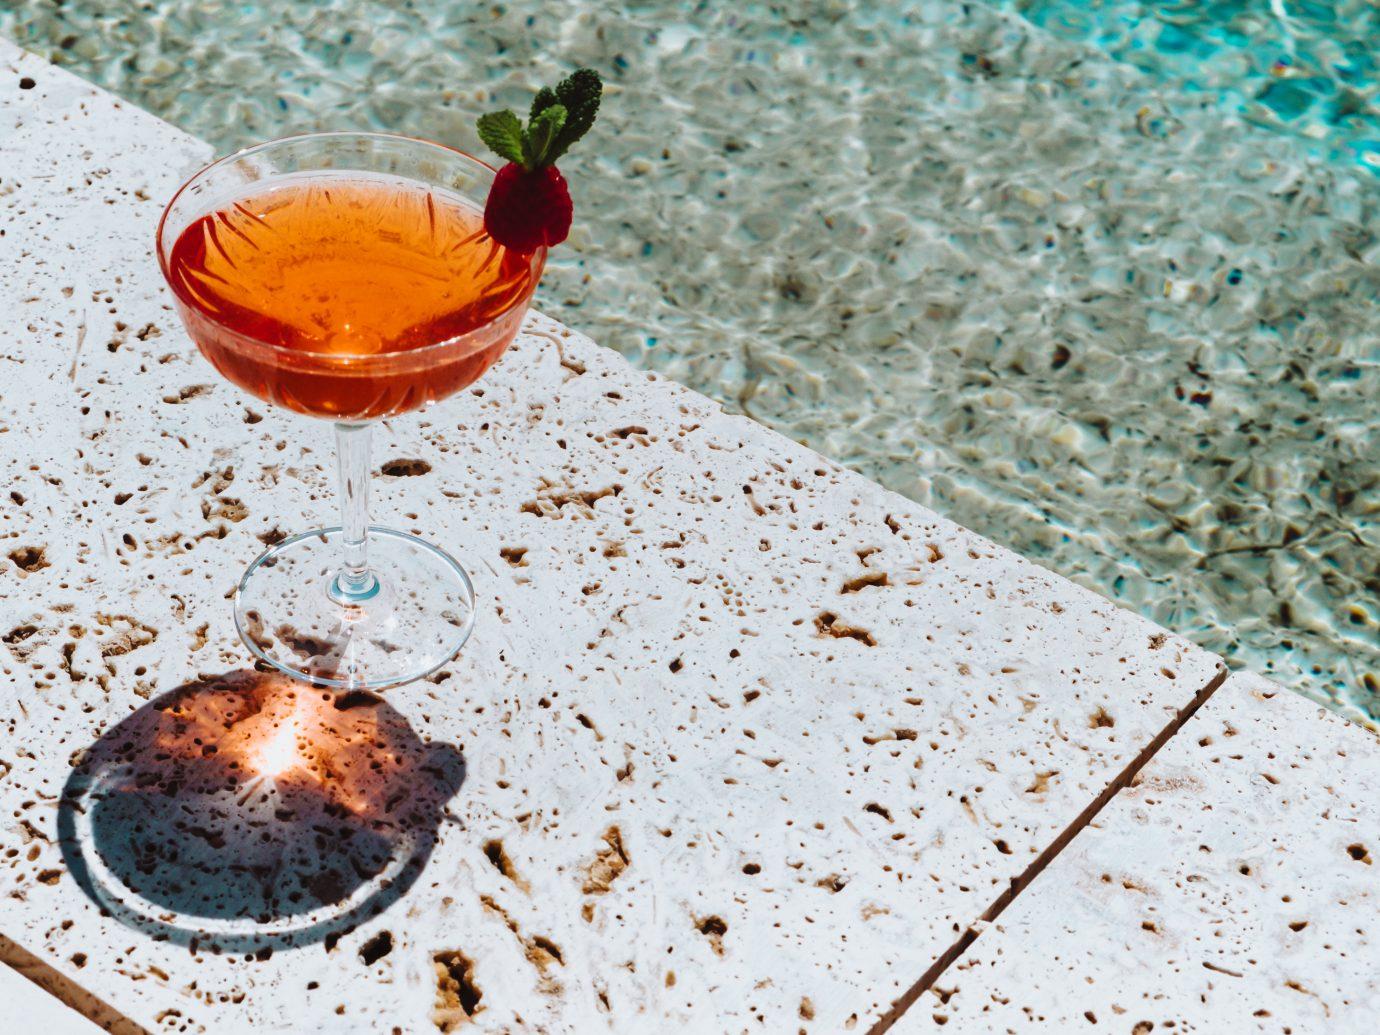 Azimuth Pool and Rooftop Bar, Almanac Hotel, Barcelona